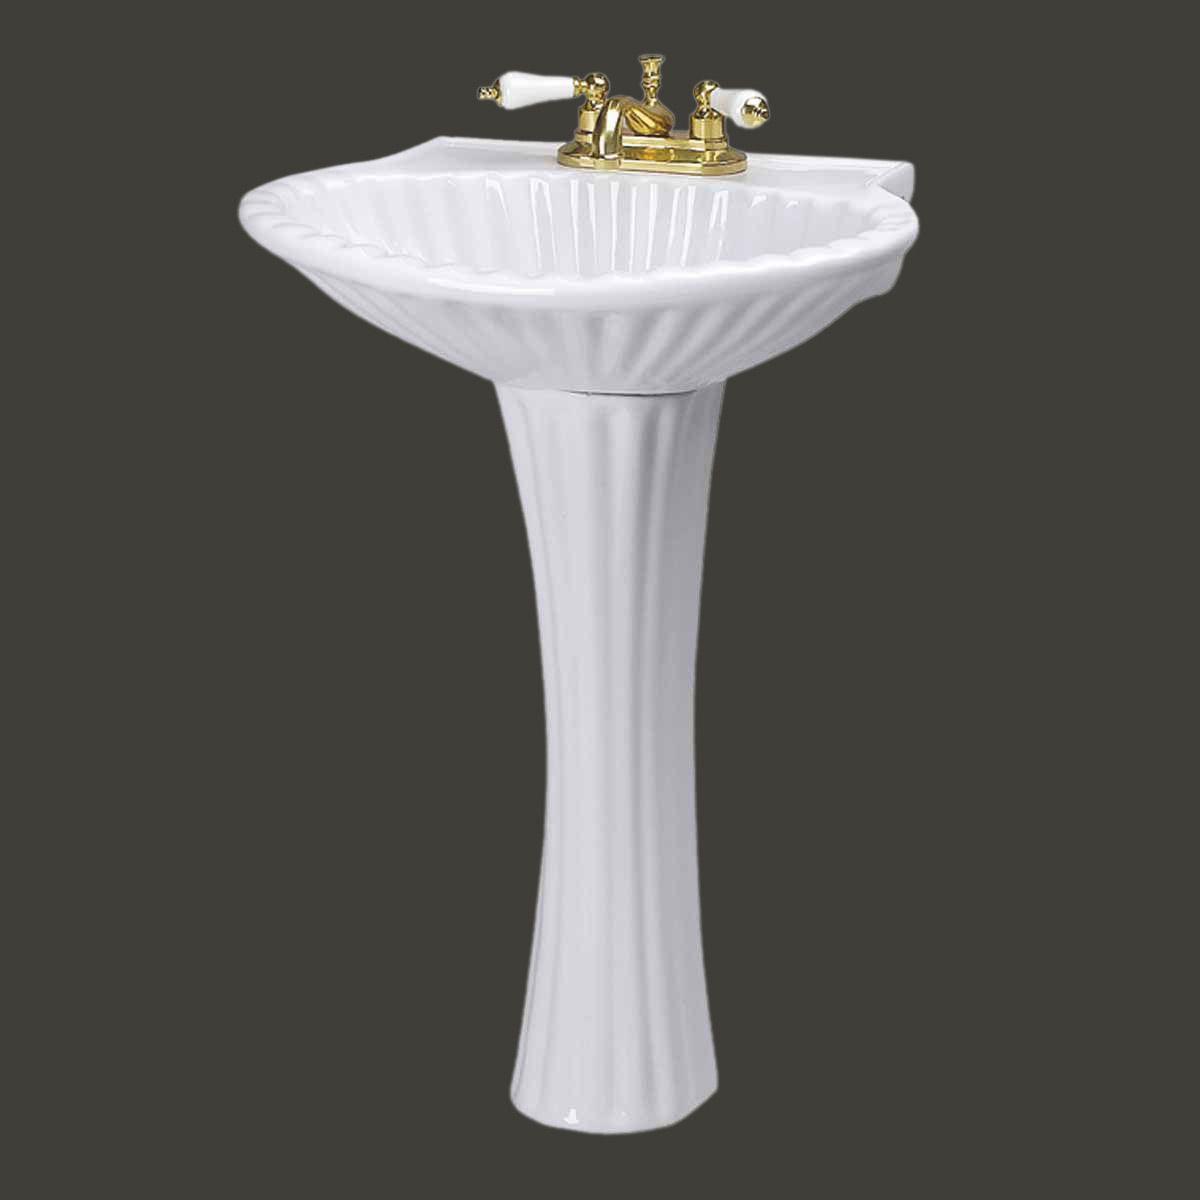 Bathroom Pedestal Sink White China Sea Shell